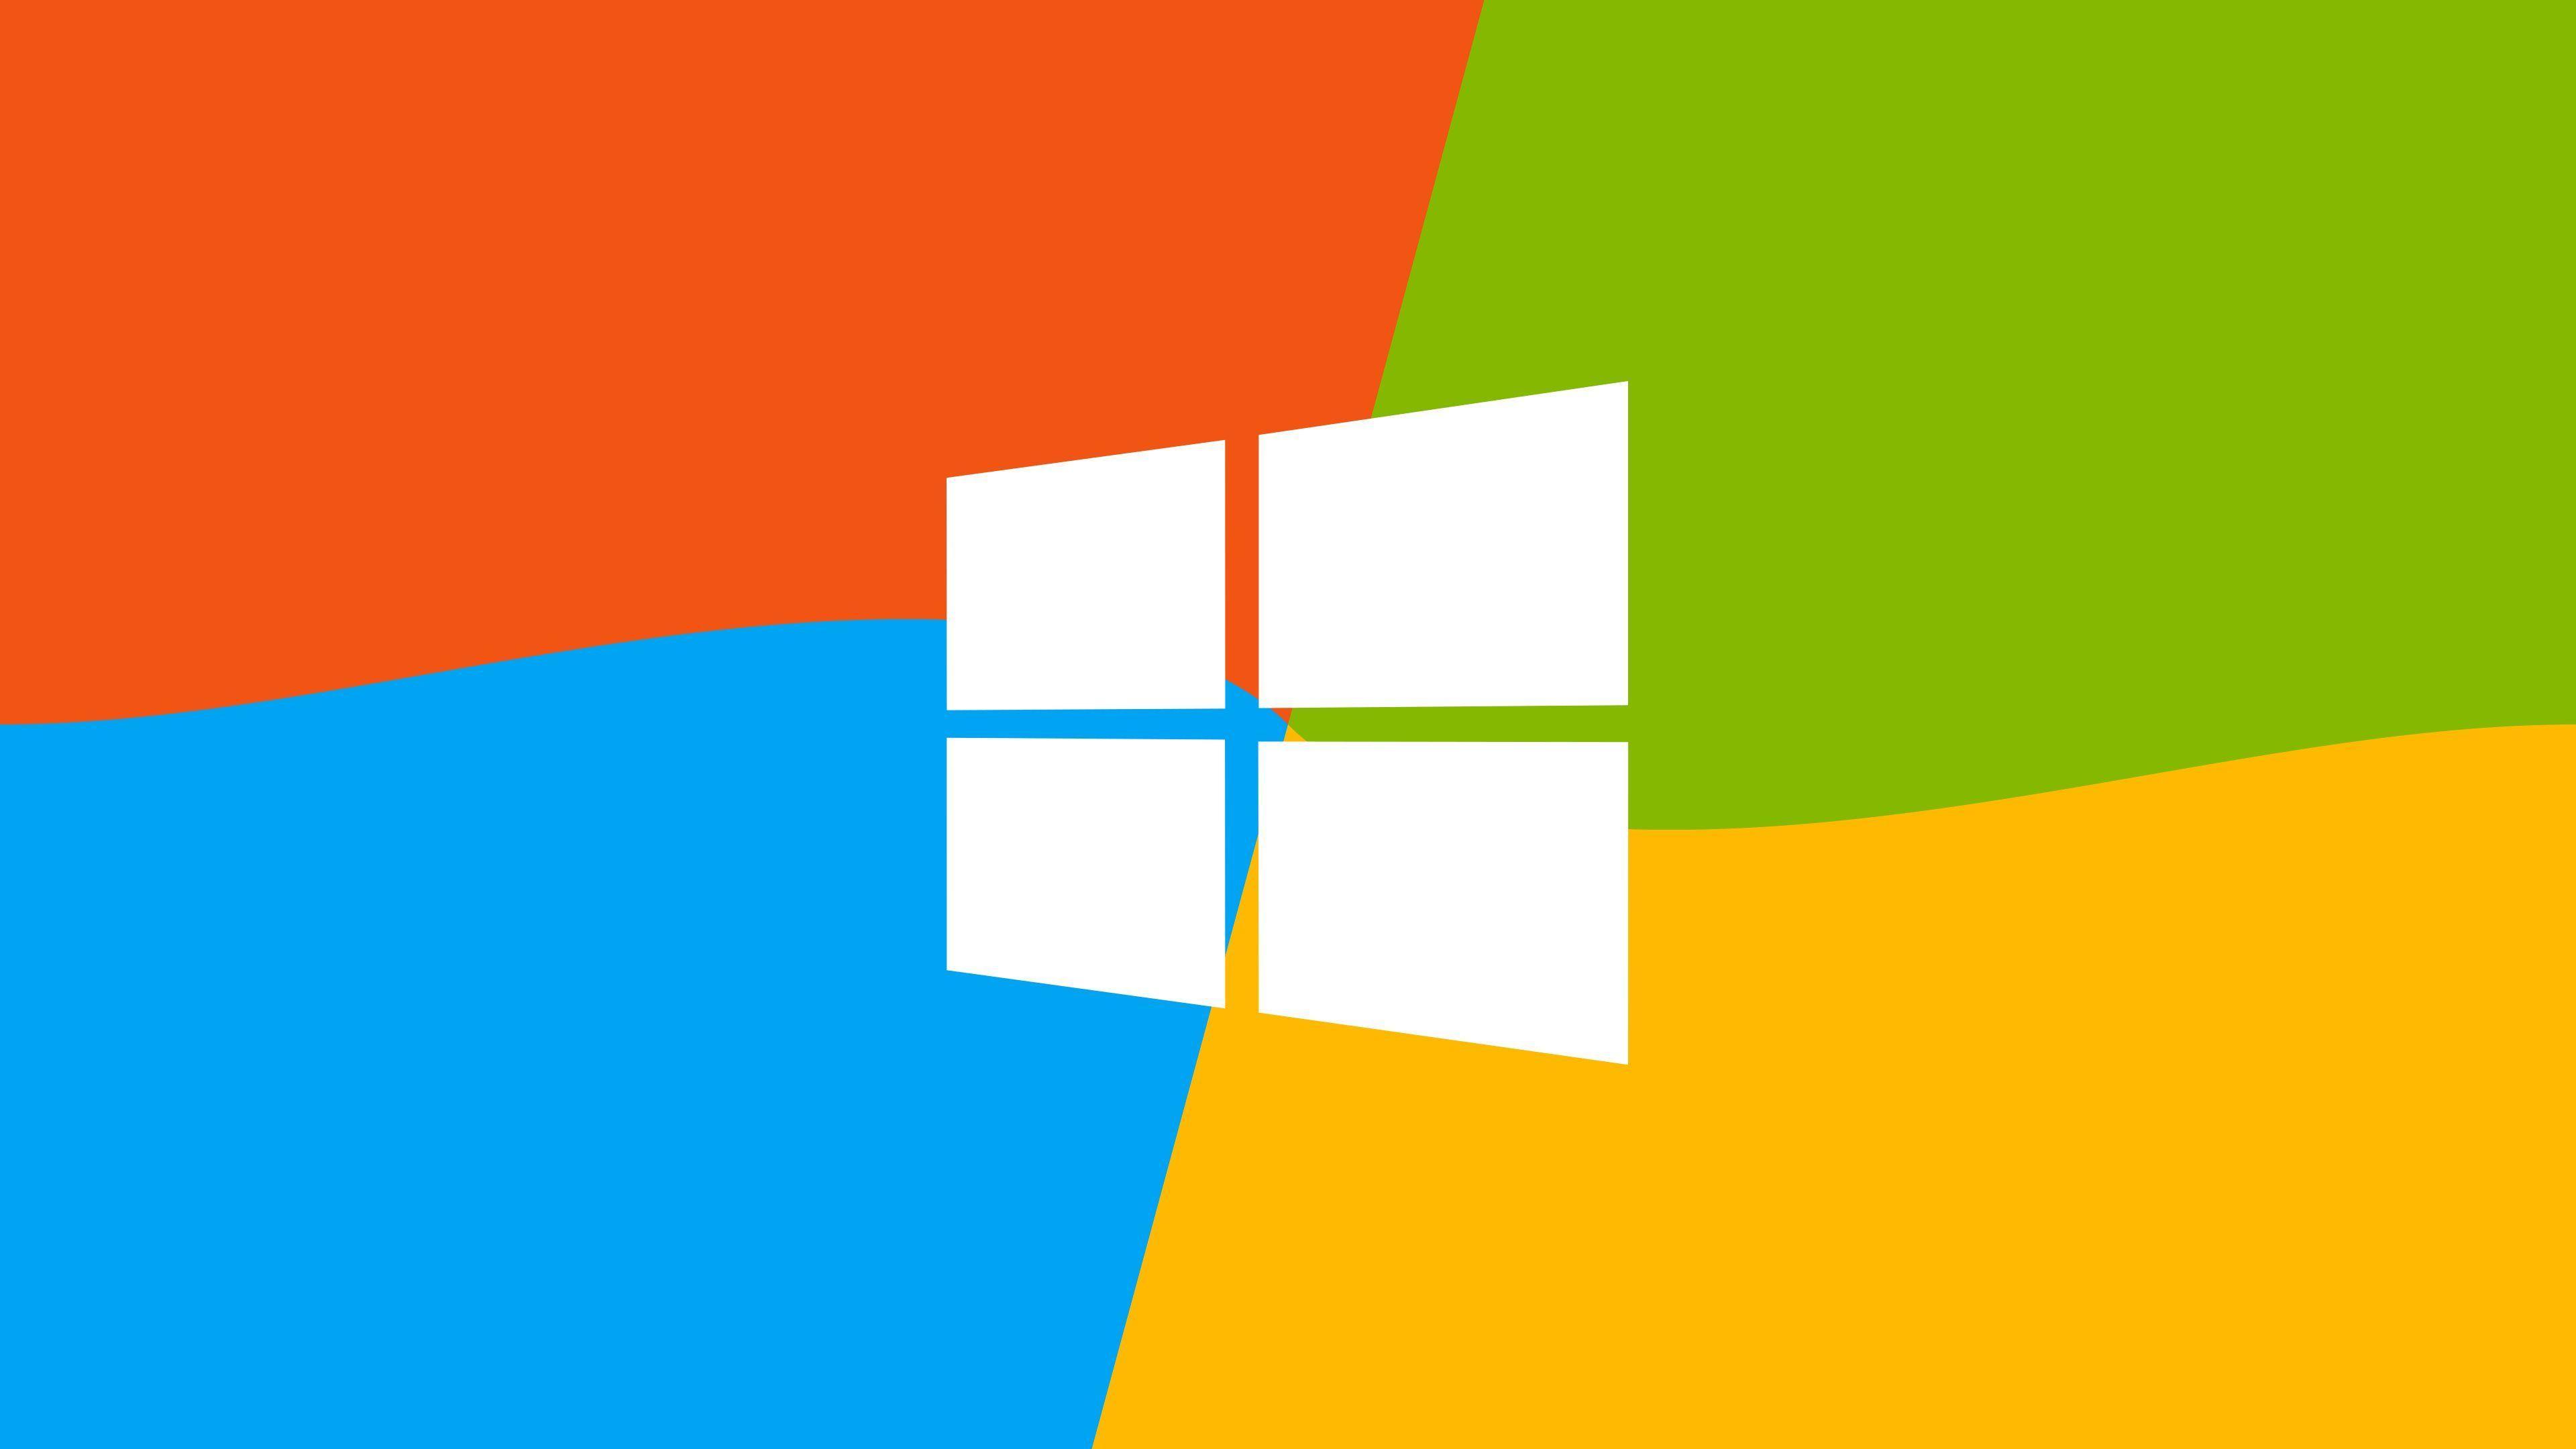 Ultra Hd Windows Wallpapers Top Free Ultra Hd Windows